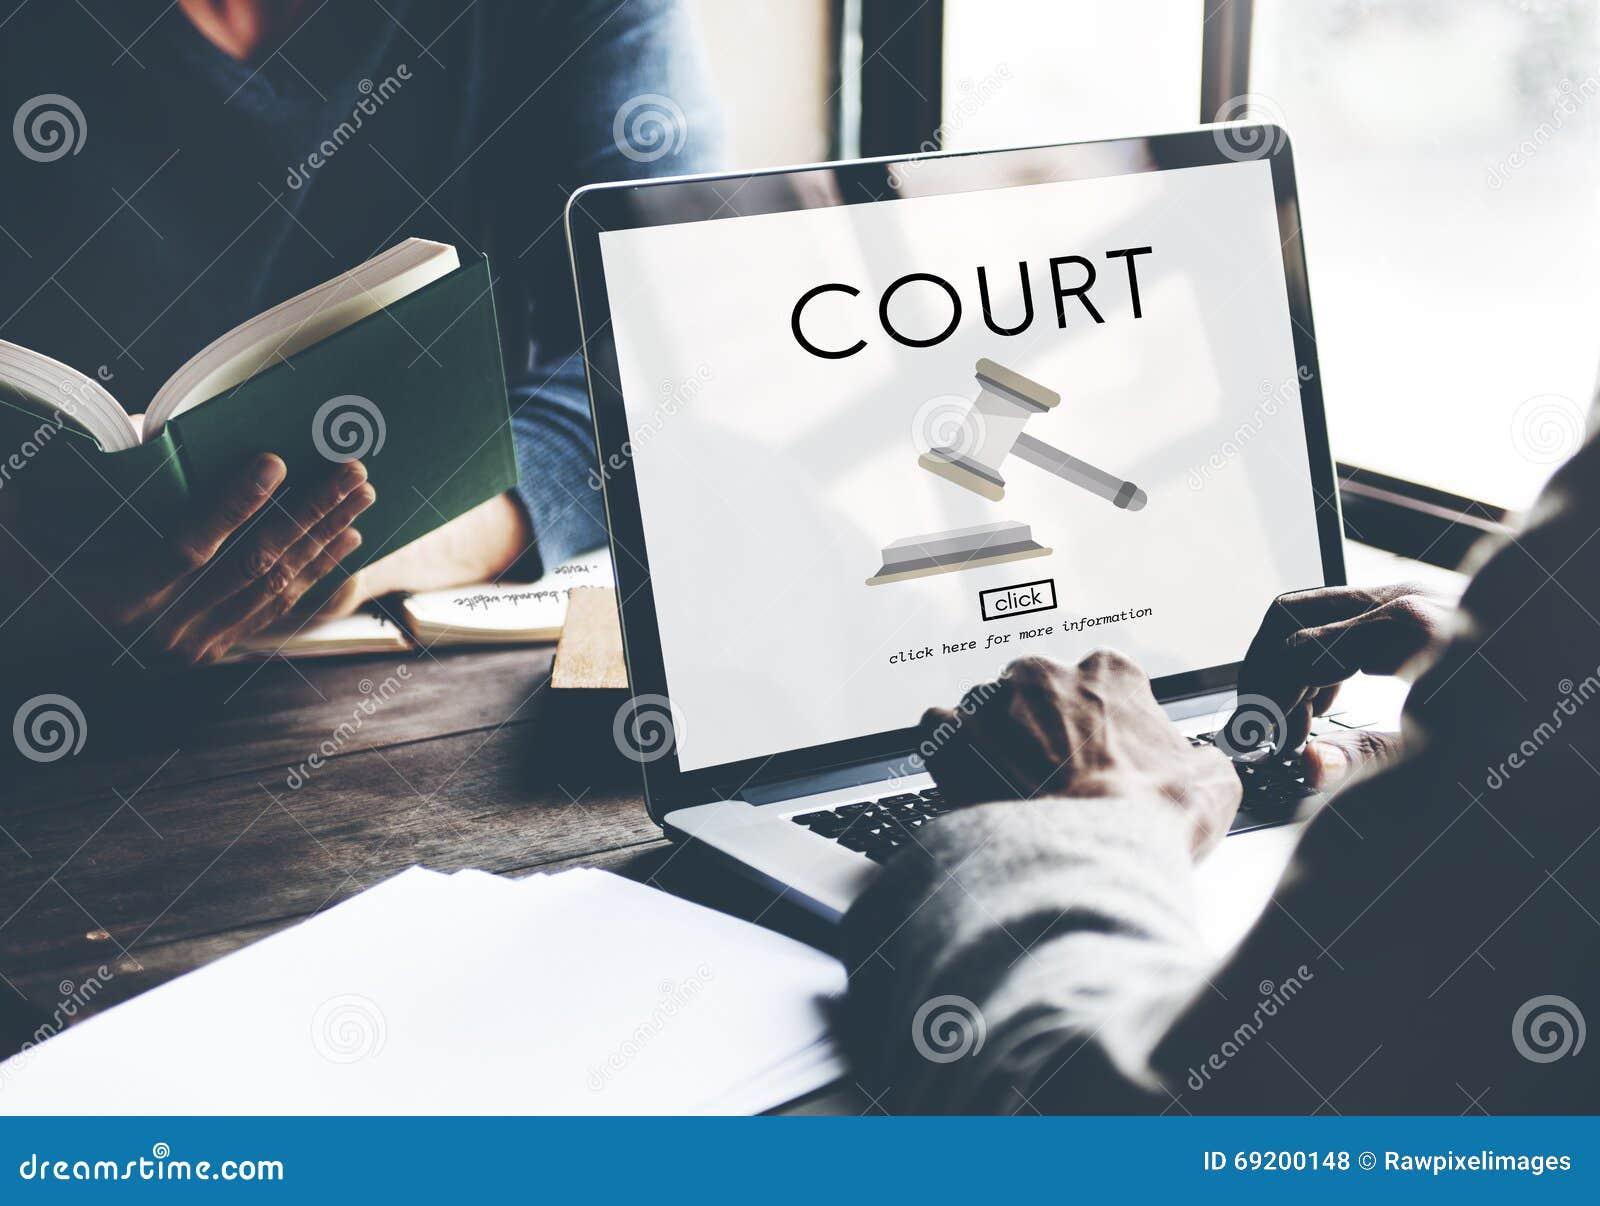 Conceito de Law Legal Order do juiz do crime da autoridade da corte